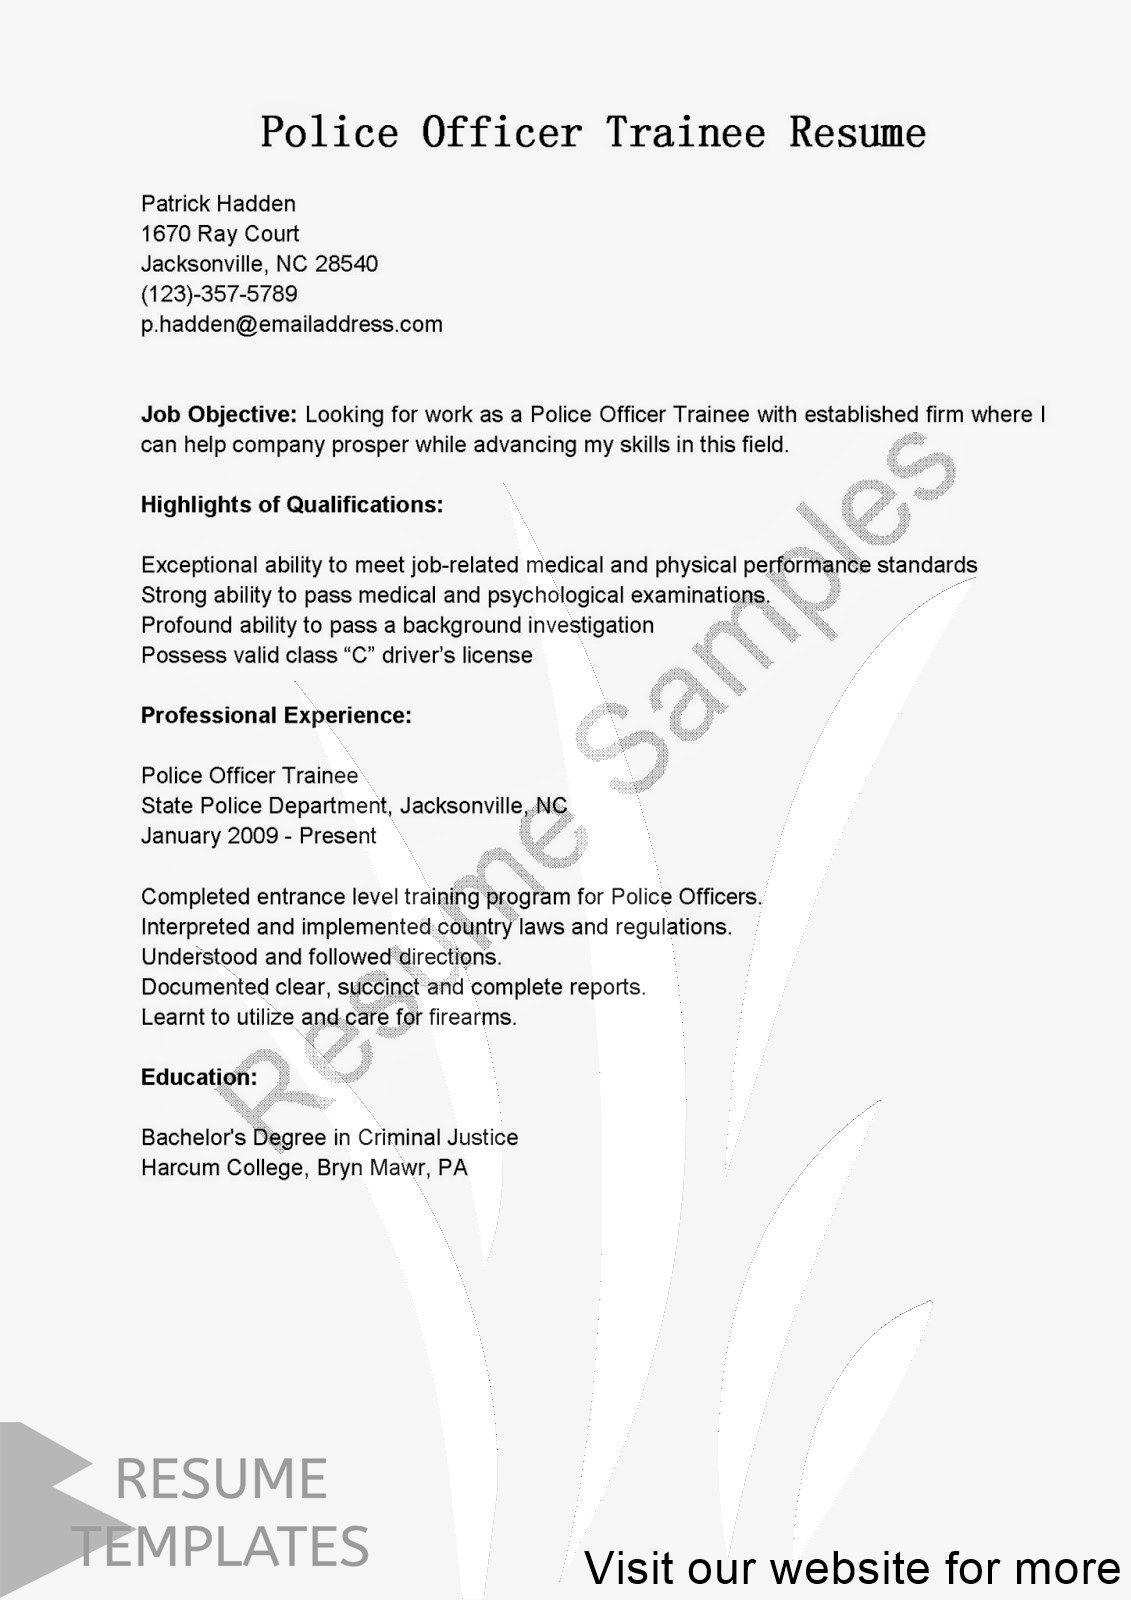 Resume Templates Australia Free Download